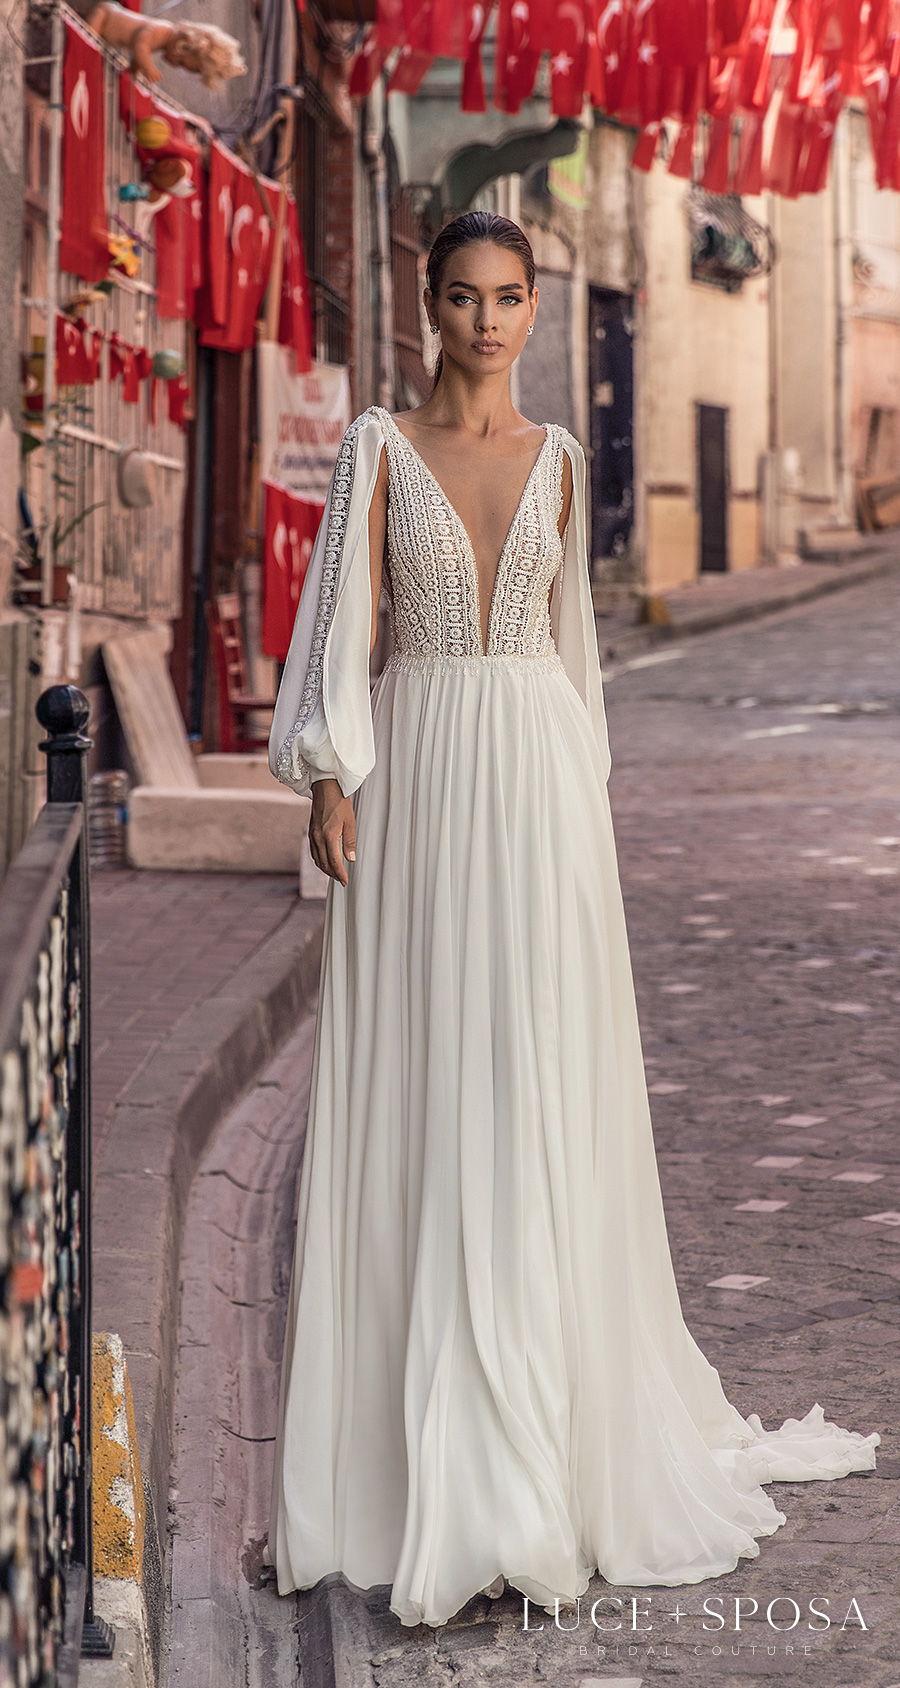 luce sposa s2021 istanbul bridal long bishop sleeves deep plunging v neck heavily embellished bodice romantic soft a  line wedding dress v back sweep train (nayeli) mv